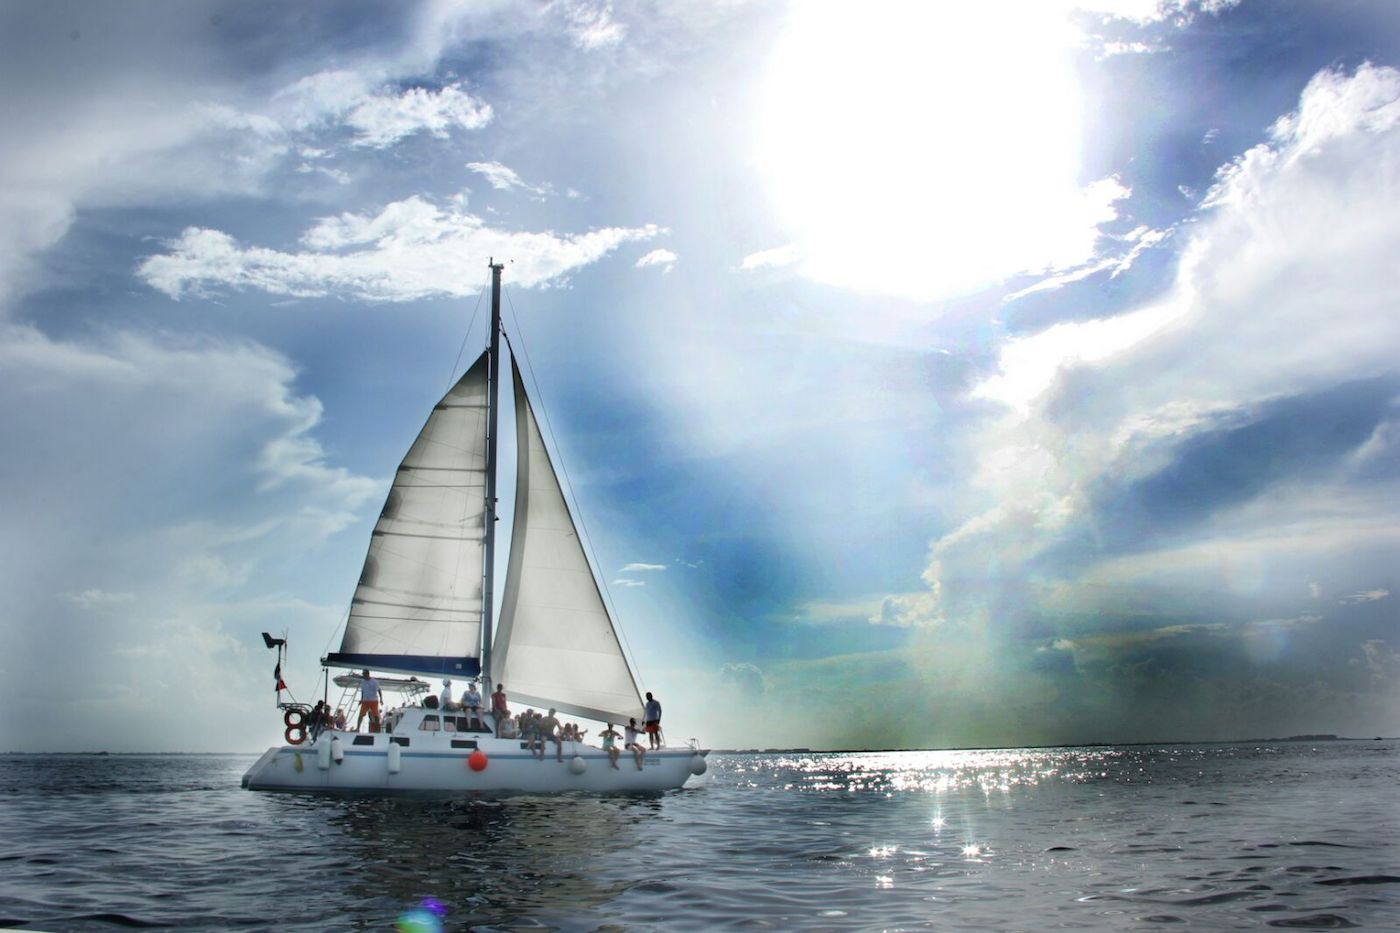 Sailing-Catamaran-Tours-Cancun-Isla-Mujeres